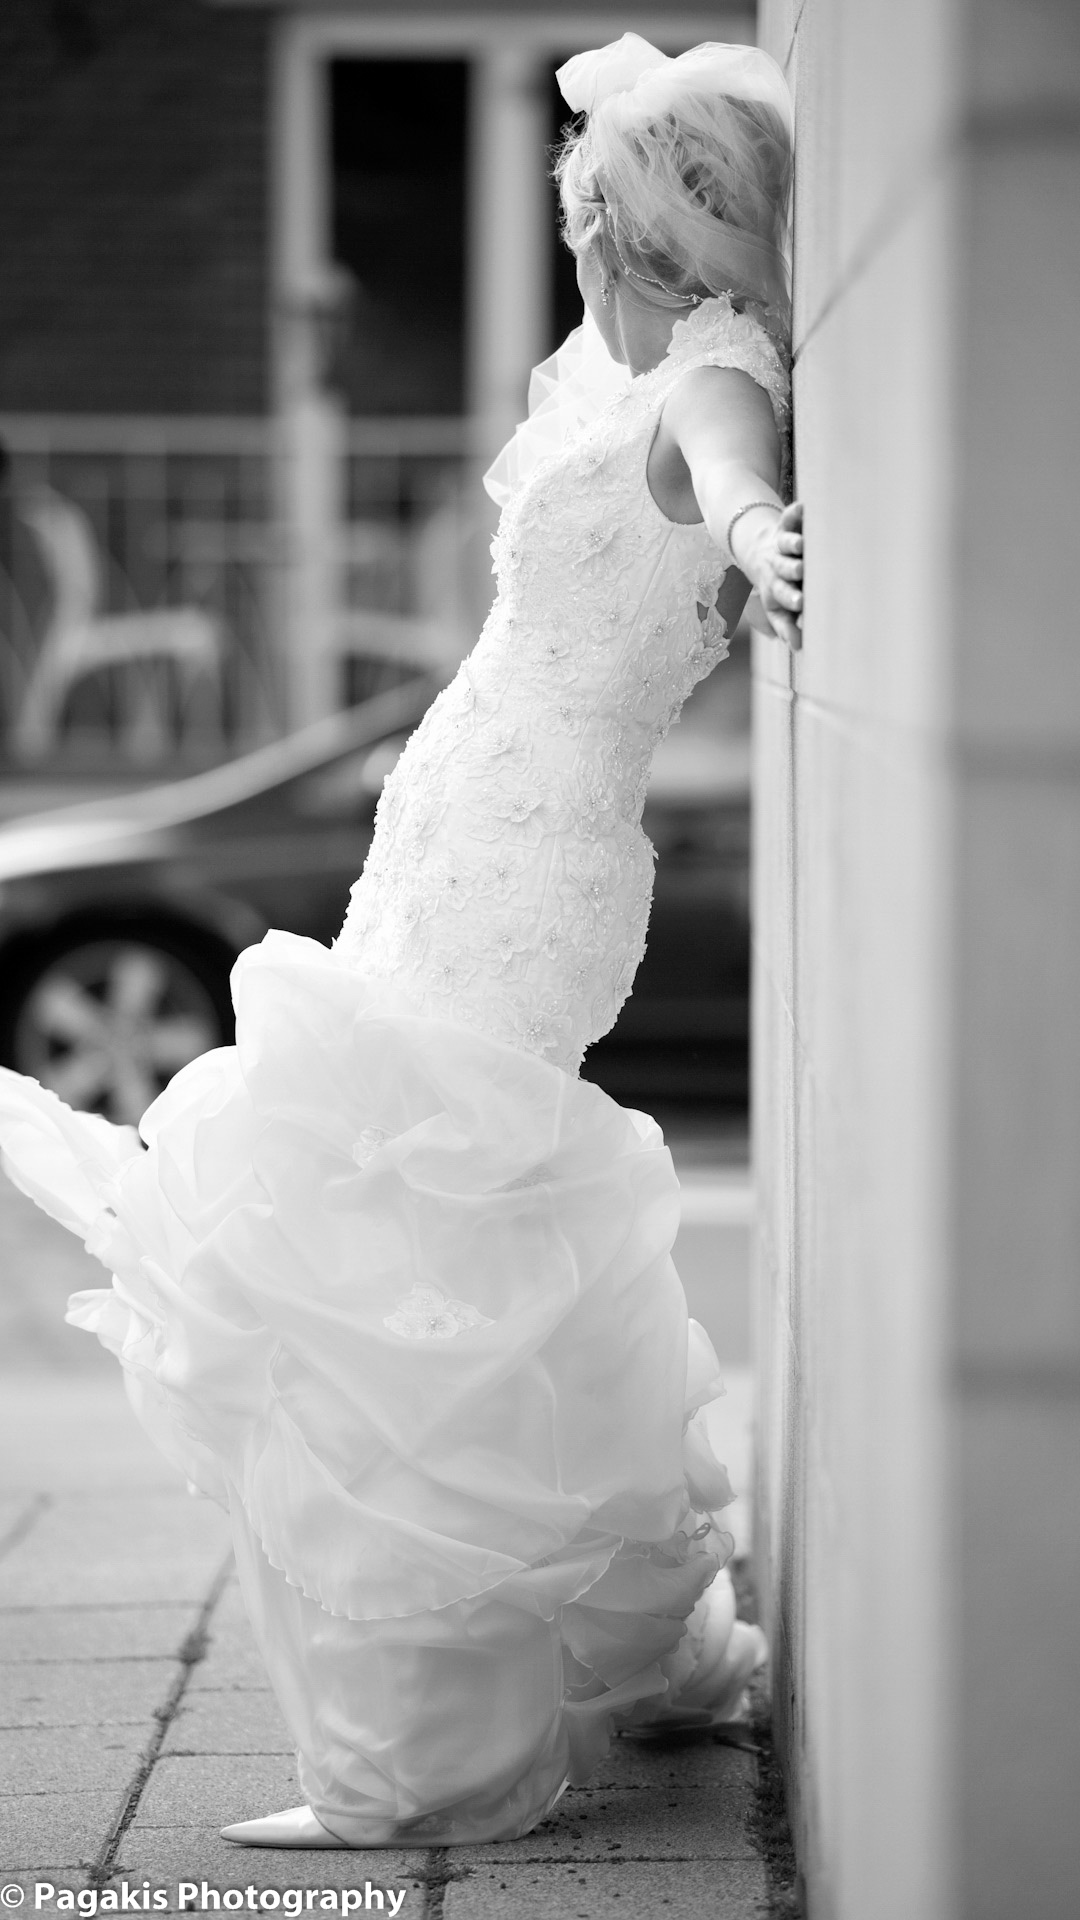 Mariage Montreal robe de mariee 2